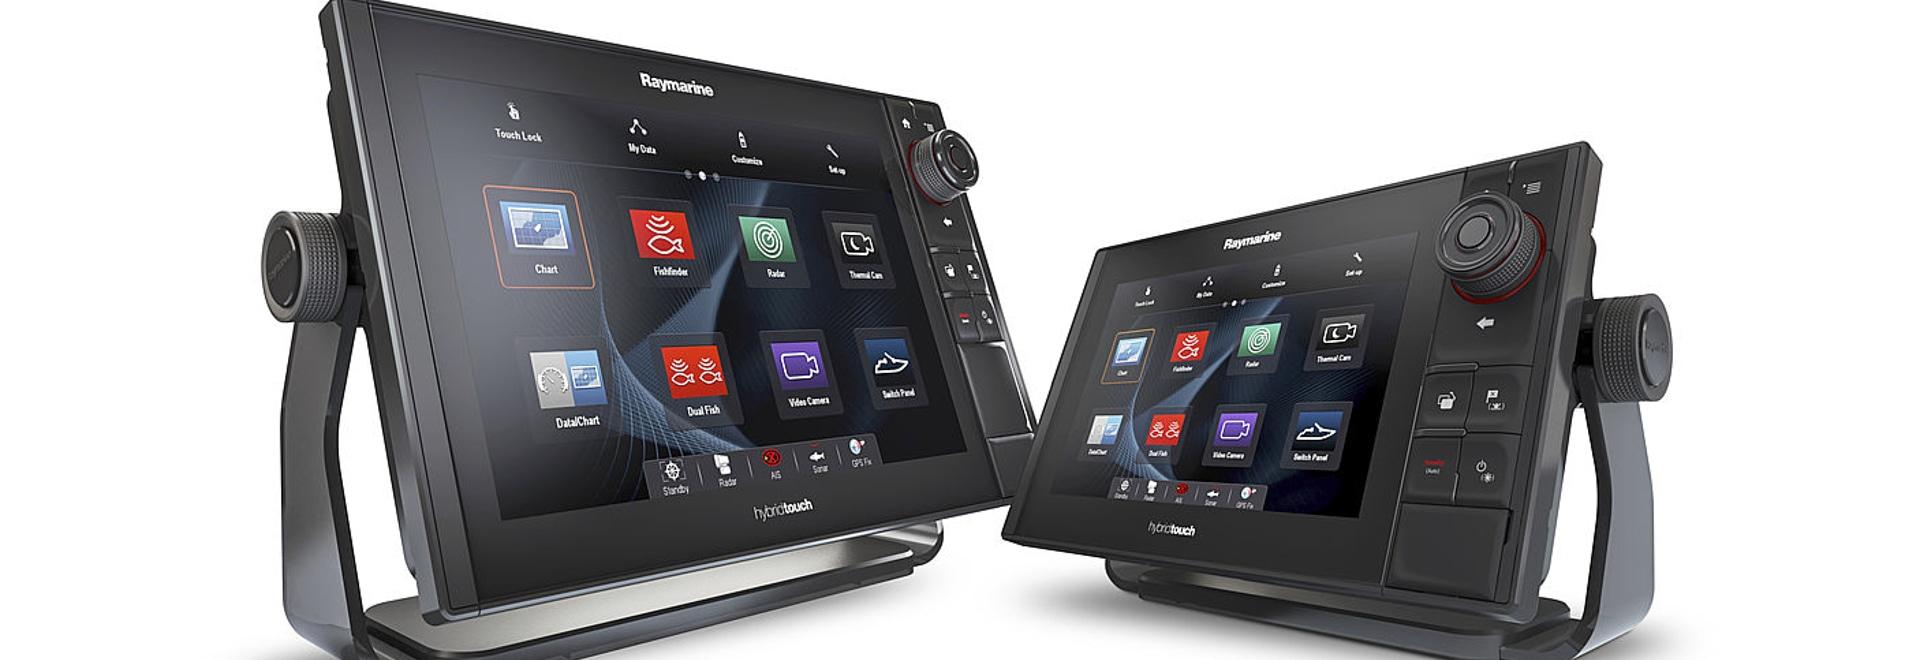 FLIR Announces Raymarine eS Series High Performance Navigation Displays